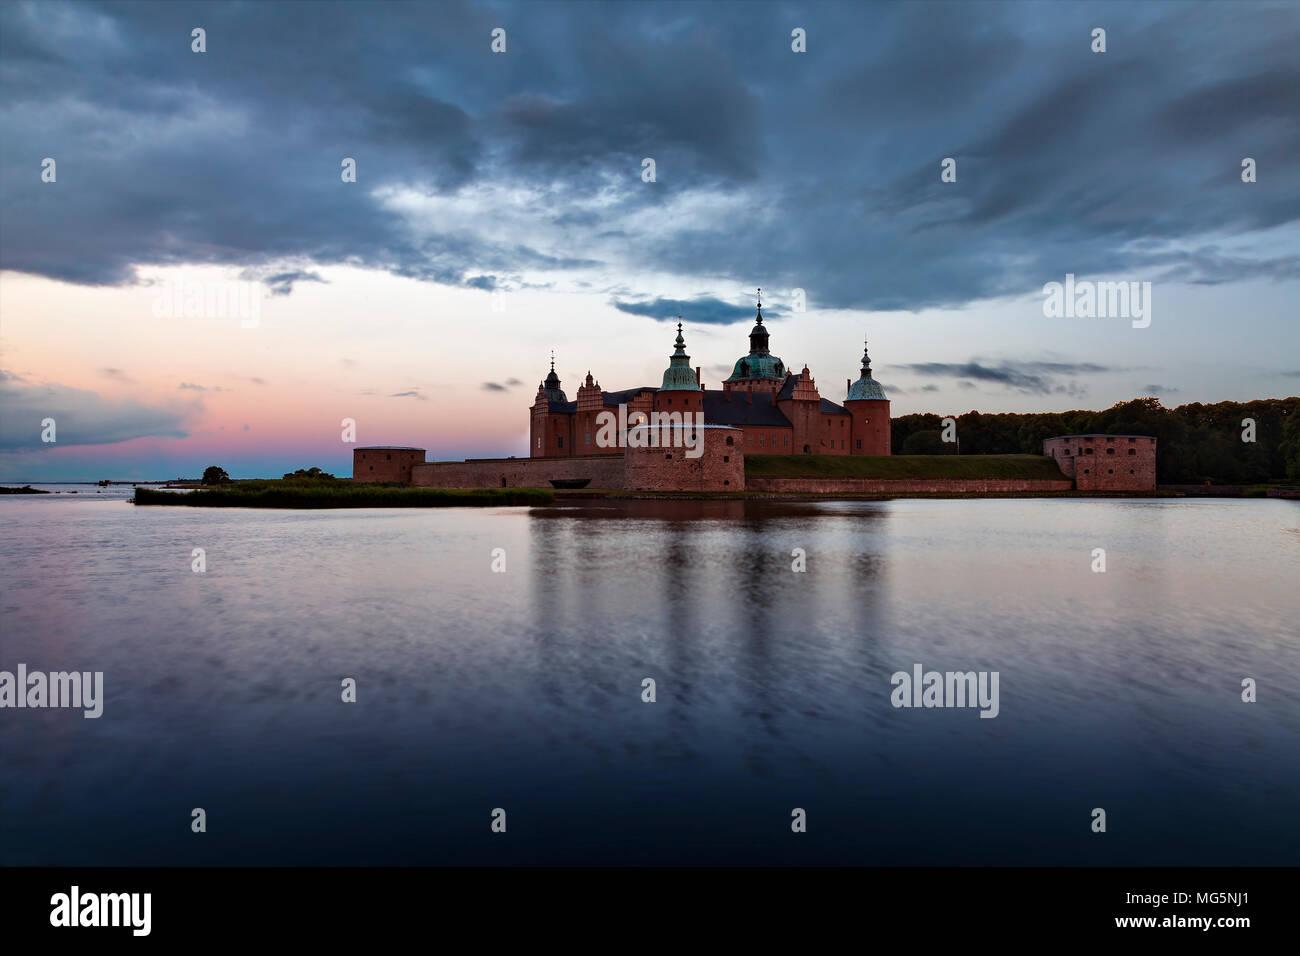 The historical waterfront citadel at sunrise. Kalmar, Sweden. - Stock Image